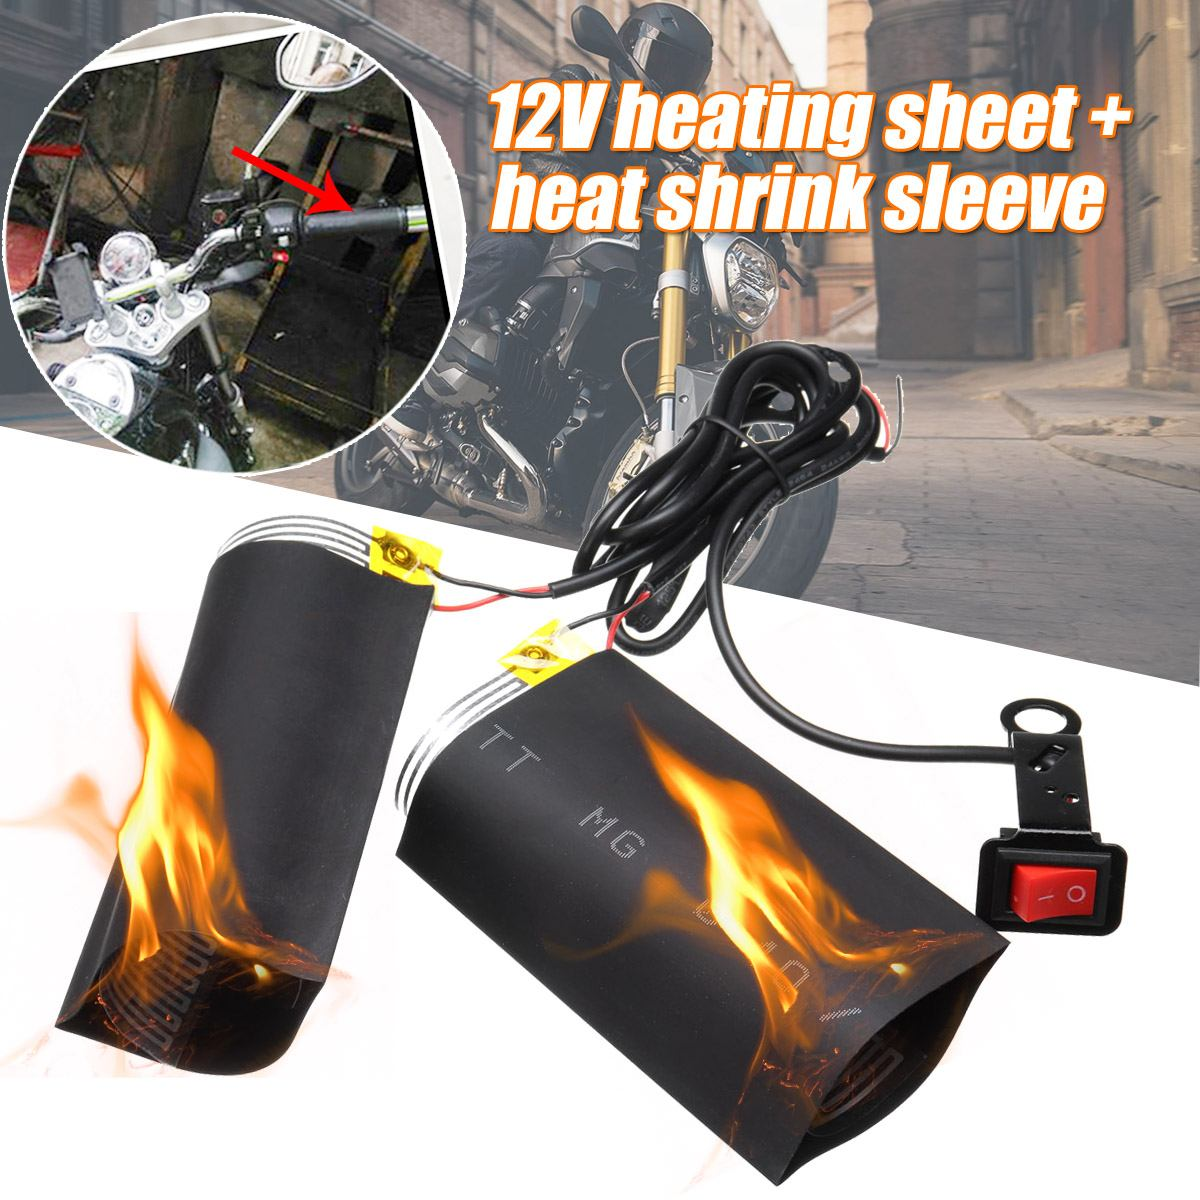 Empuñaduras calefactables universales para motocicleta de 12V, Kit de manillar calefactado, almohadilla para manillar de motocicleta